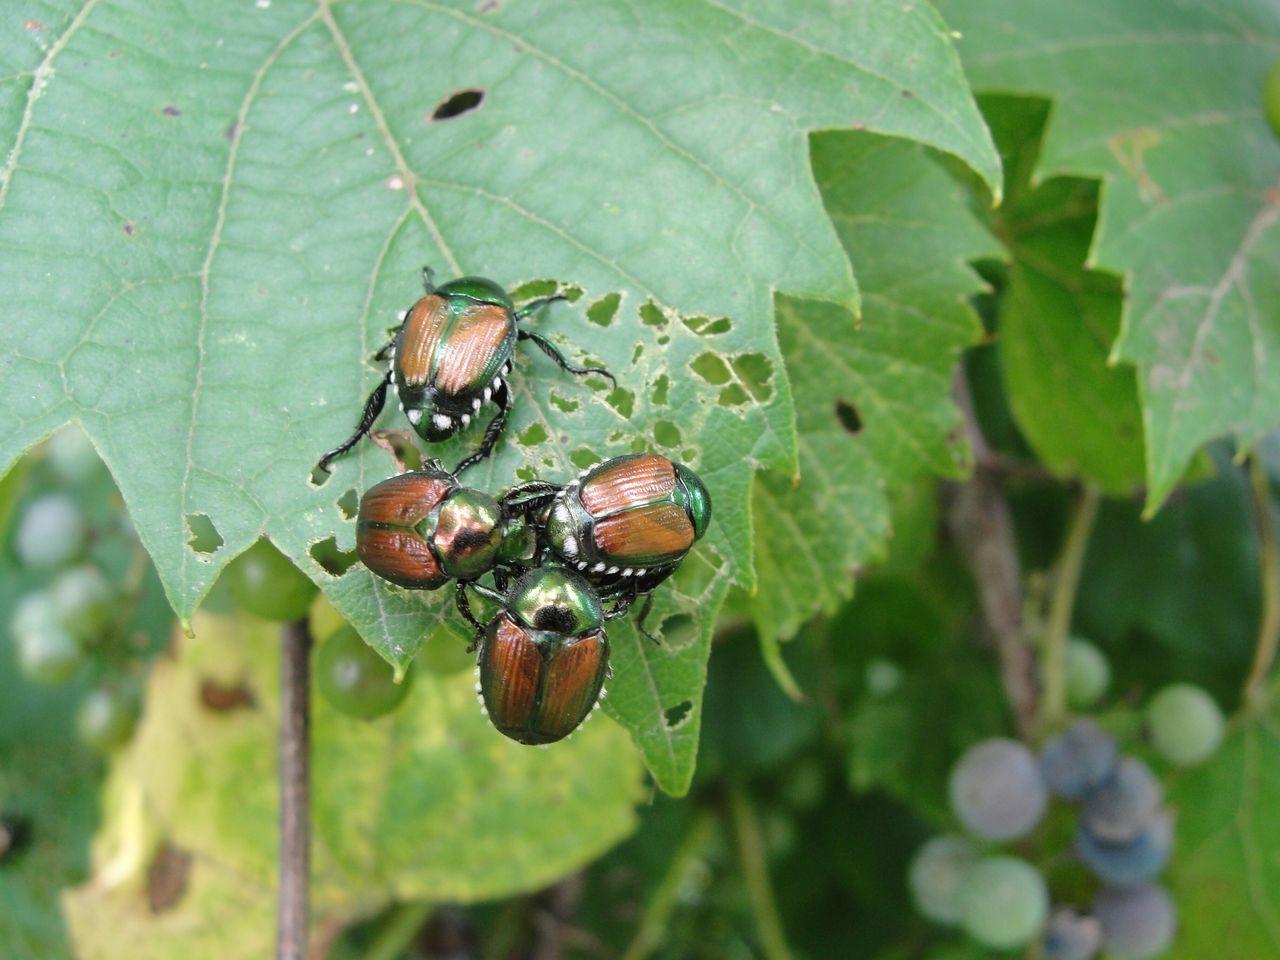 High Angle View Of Beetles On Leaf